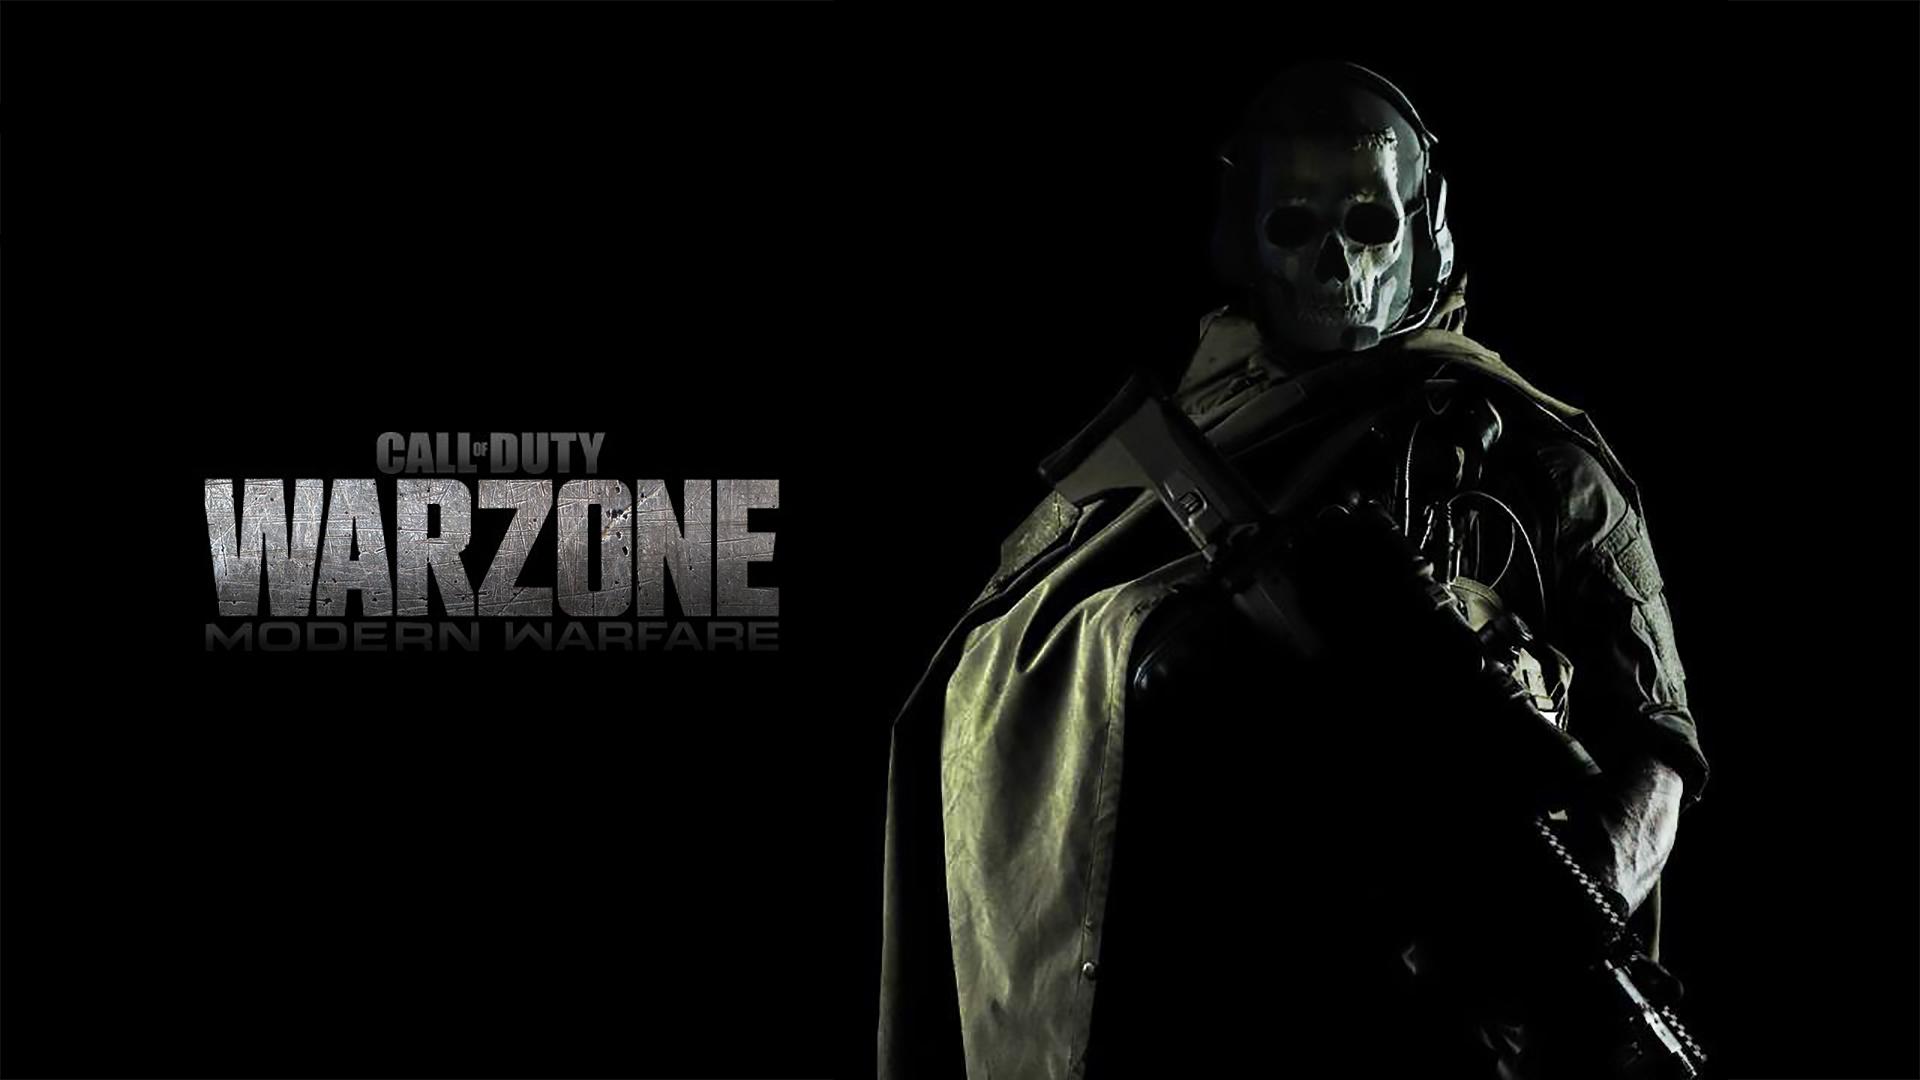 Call Of Duty Modern Warfare Warzone  Wallpaper 2 by thetruemask on 1920x1080